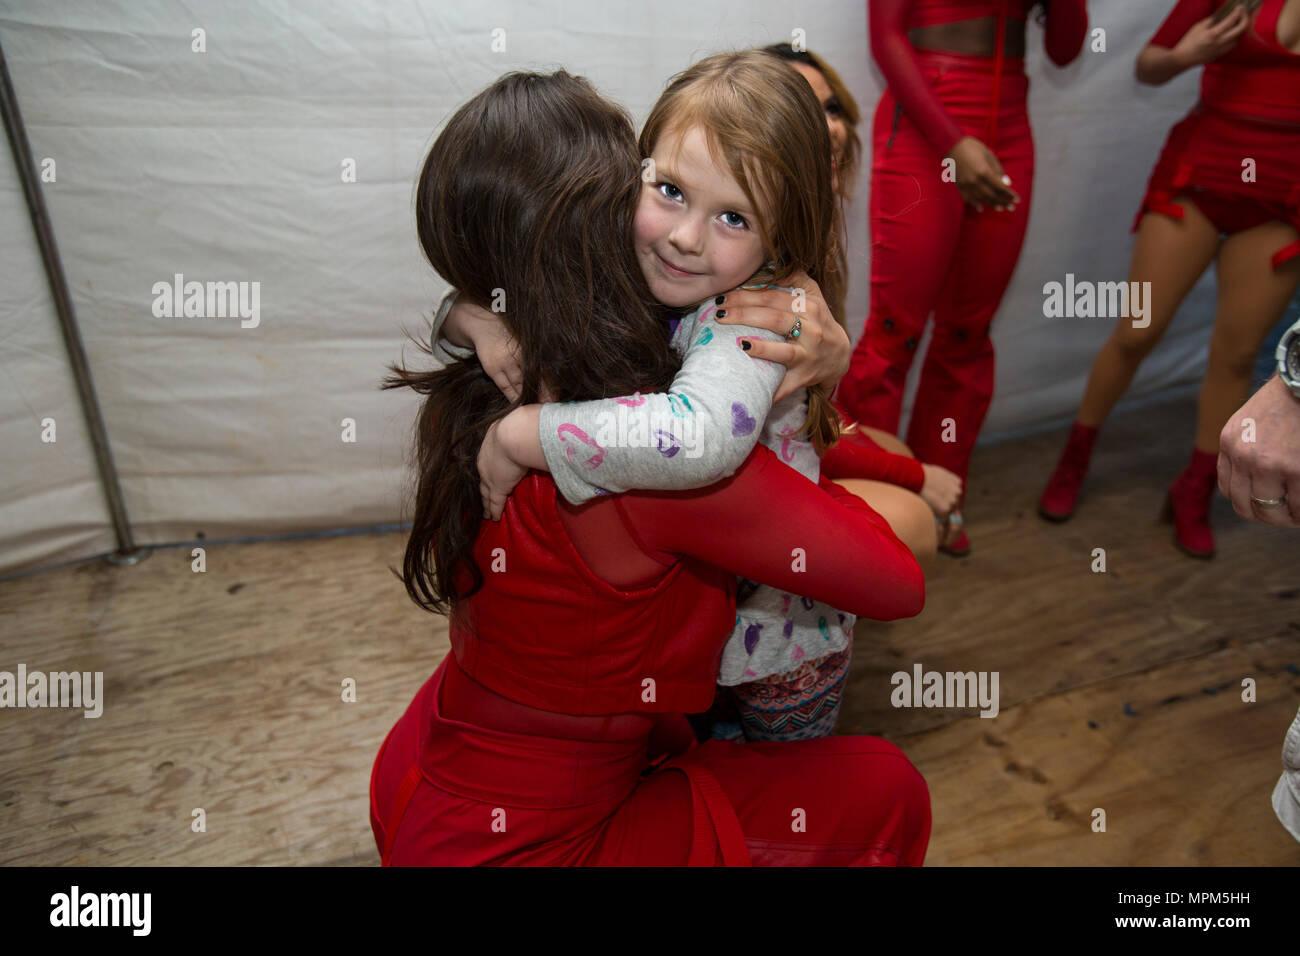 Fifth Harmony Member Lauren Jauregui Hugs A Young Fan During A